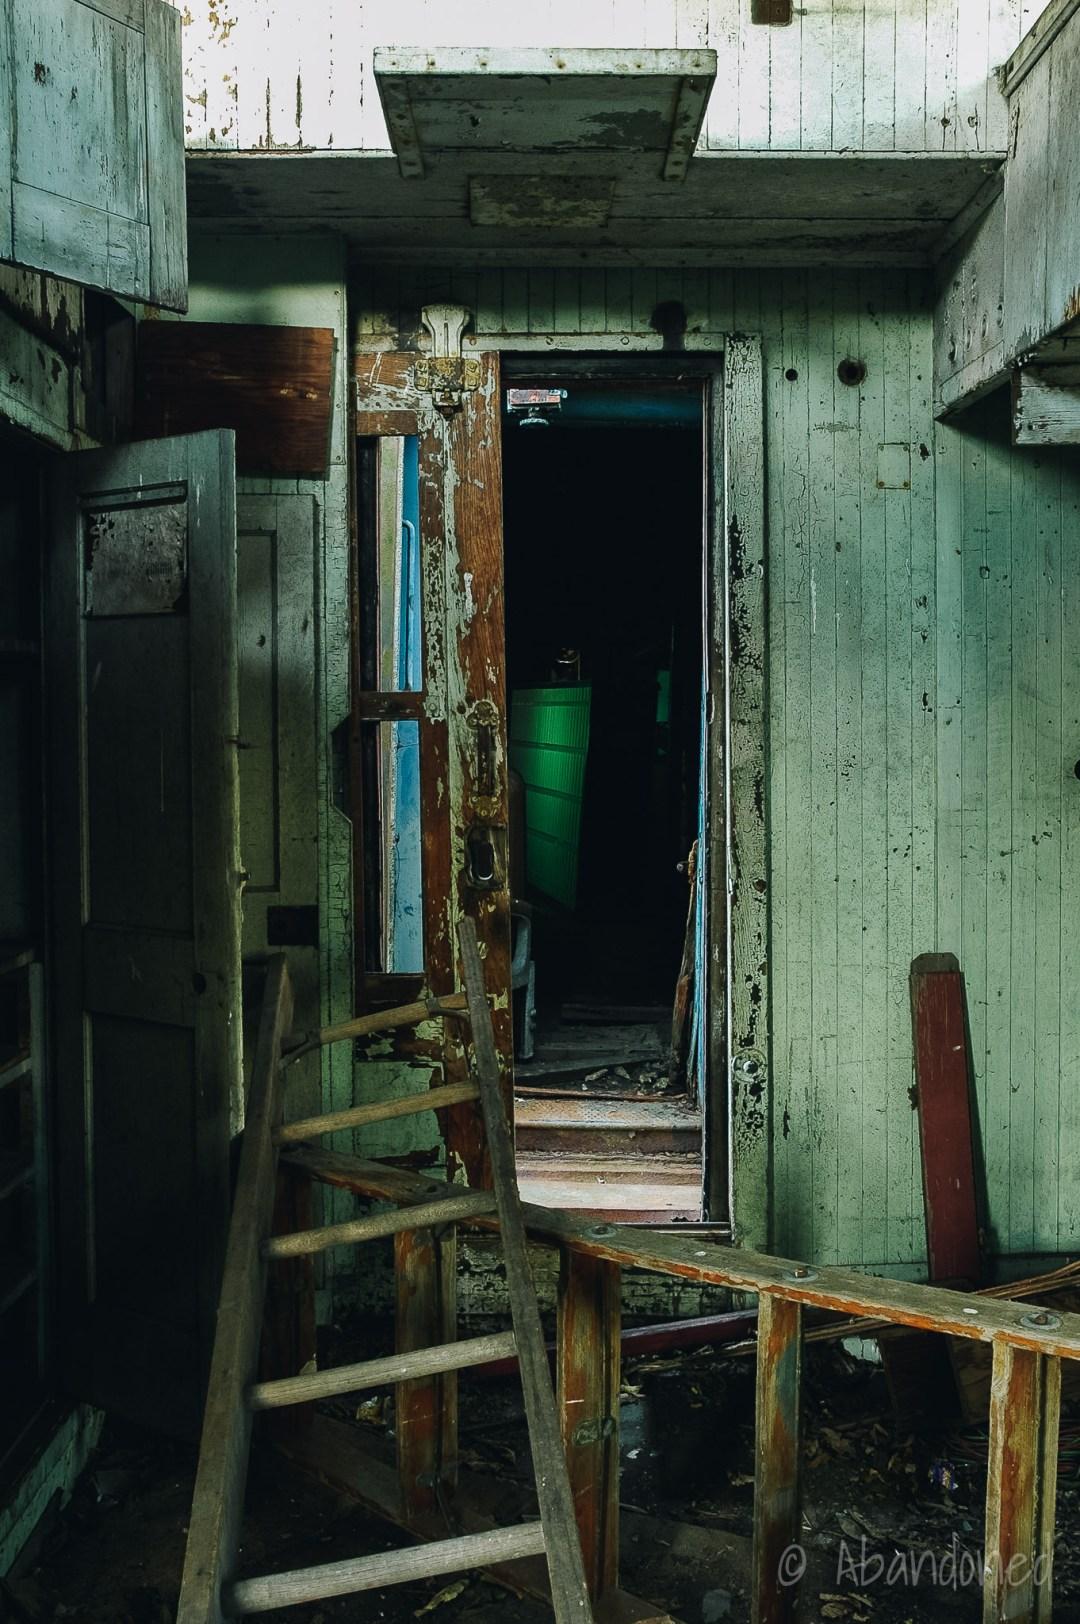 Abandoned Caboose Interior